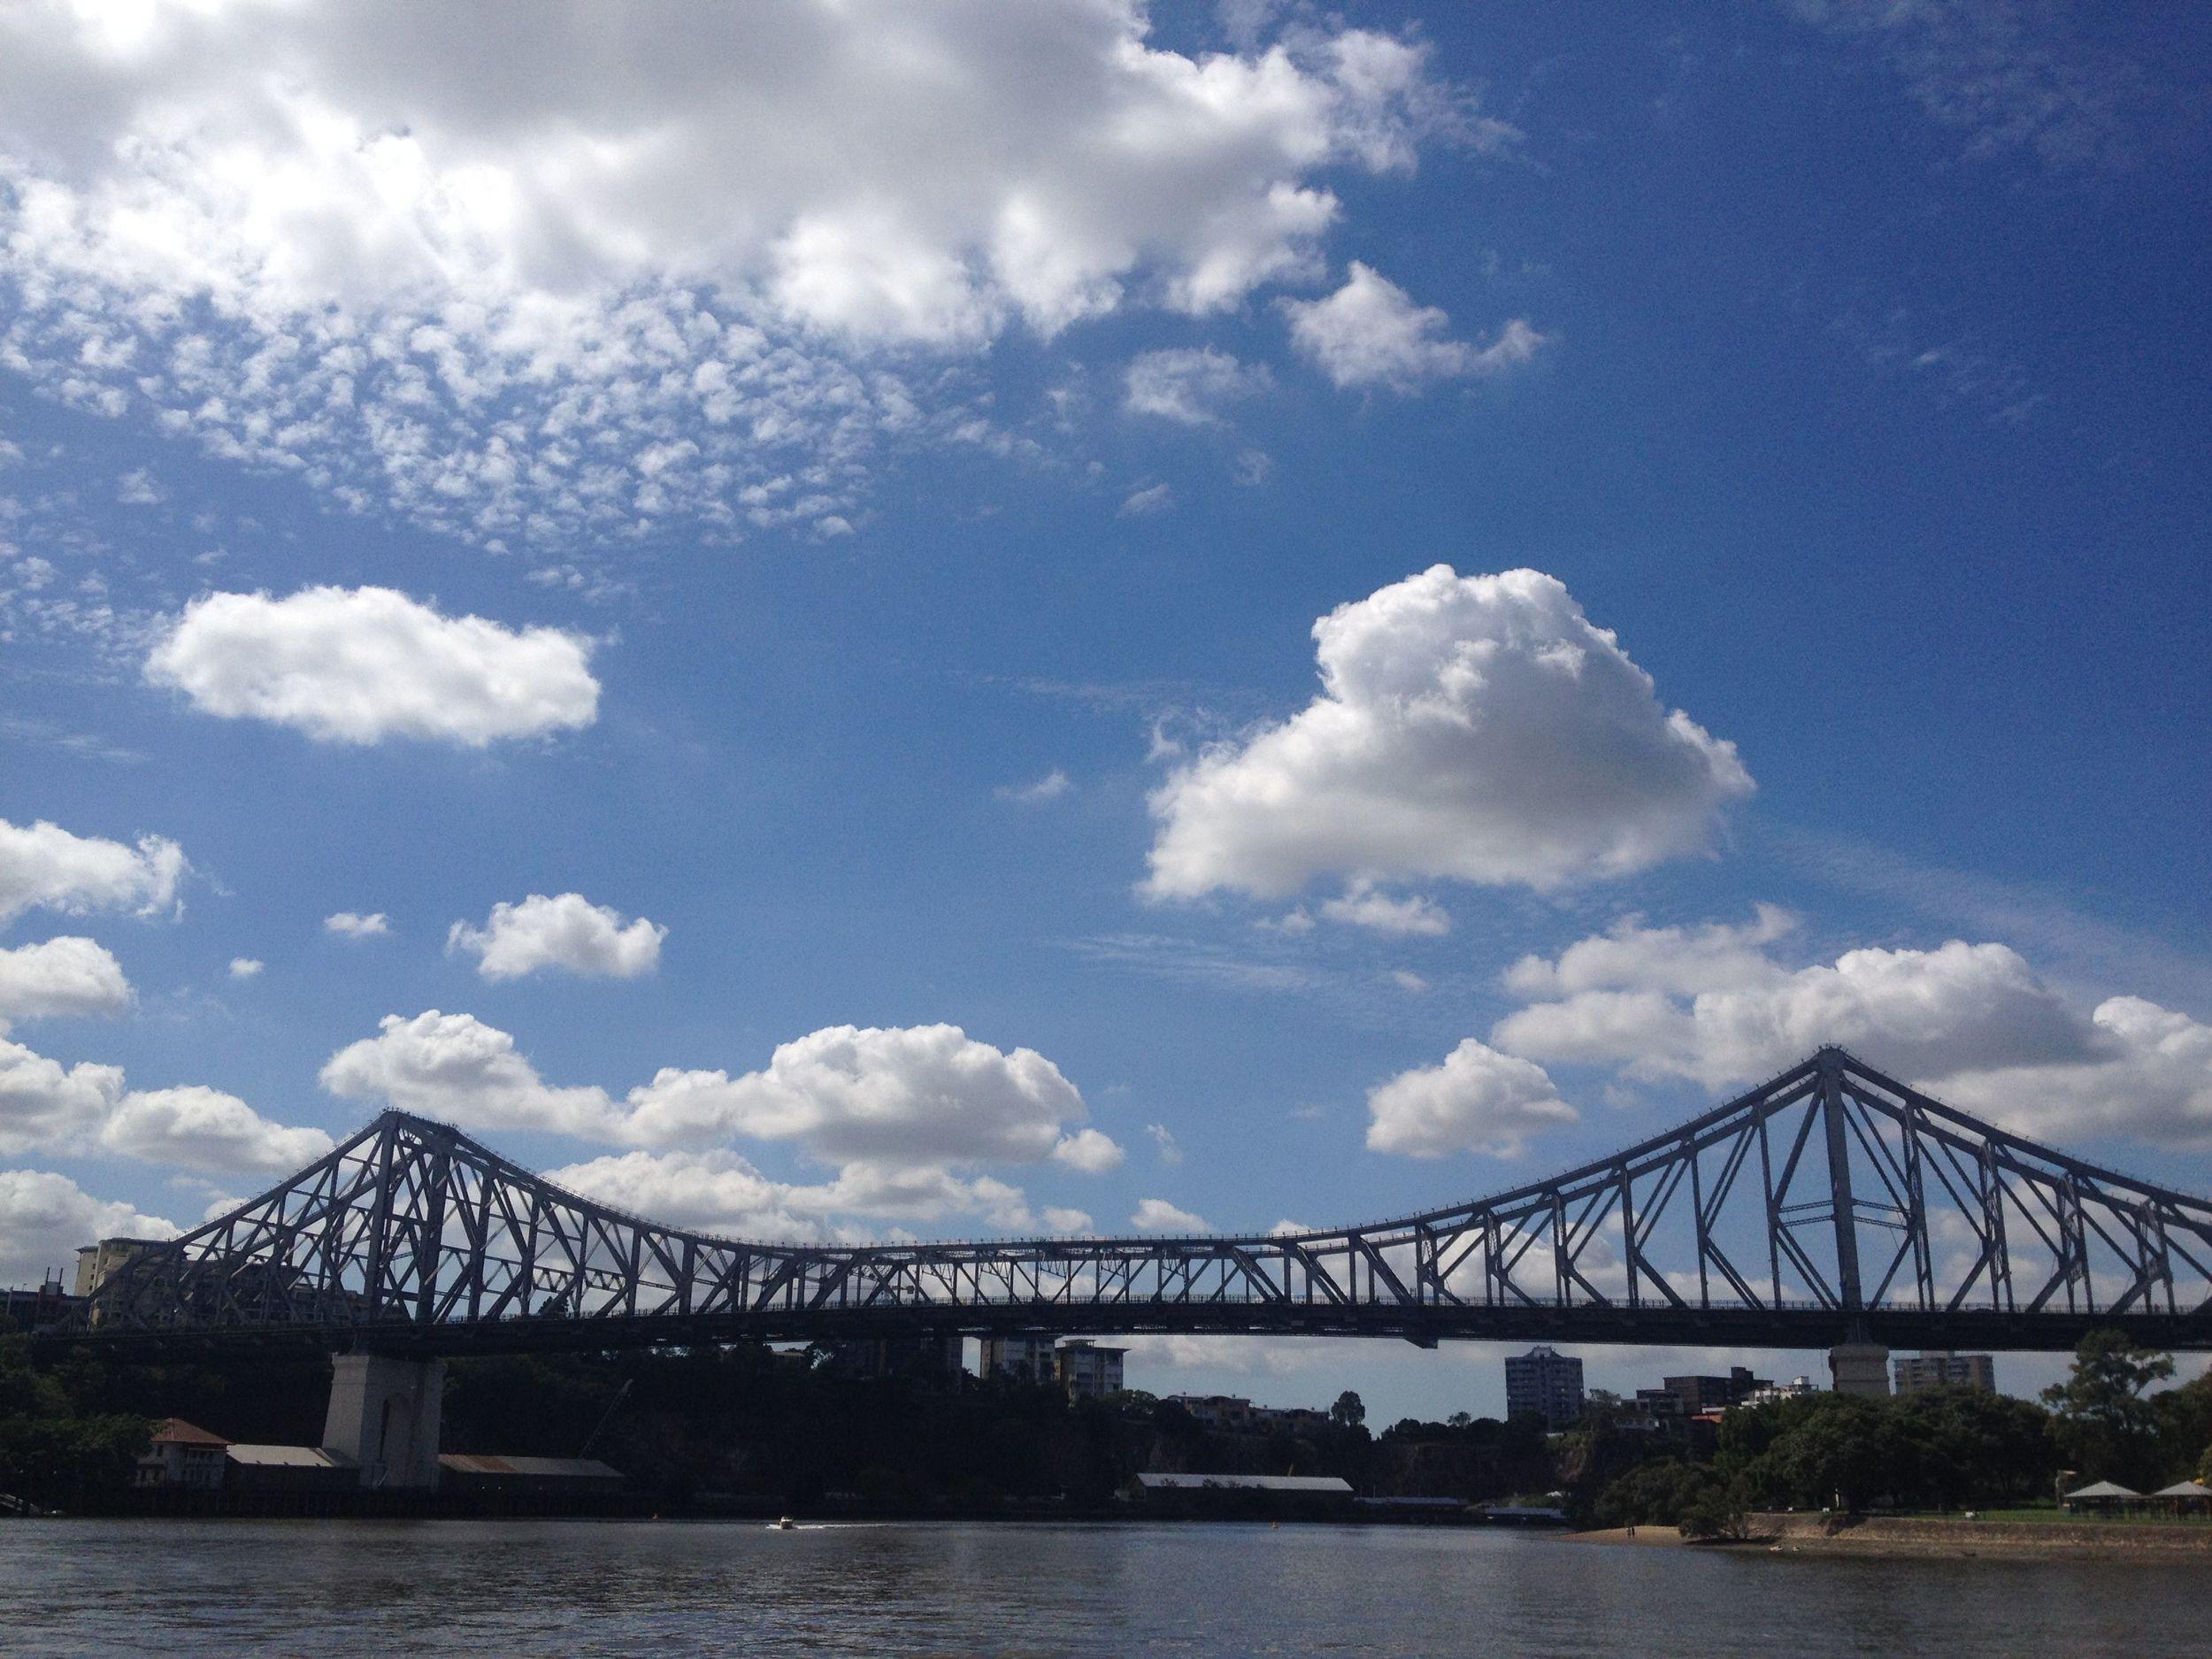 Story Bridge by day.